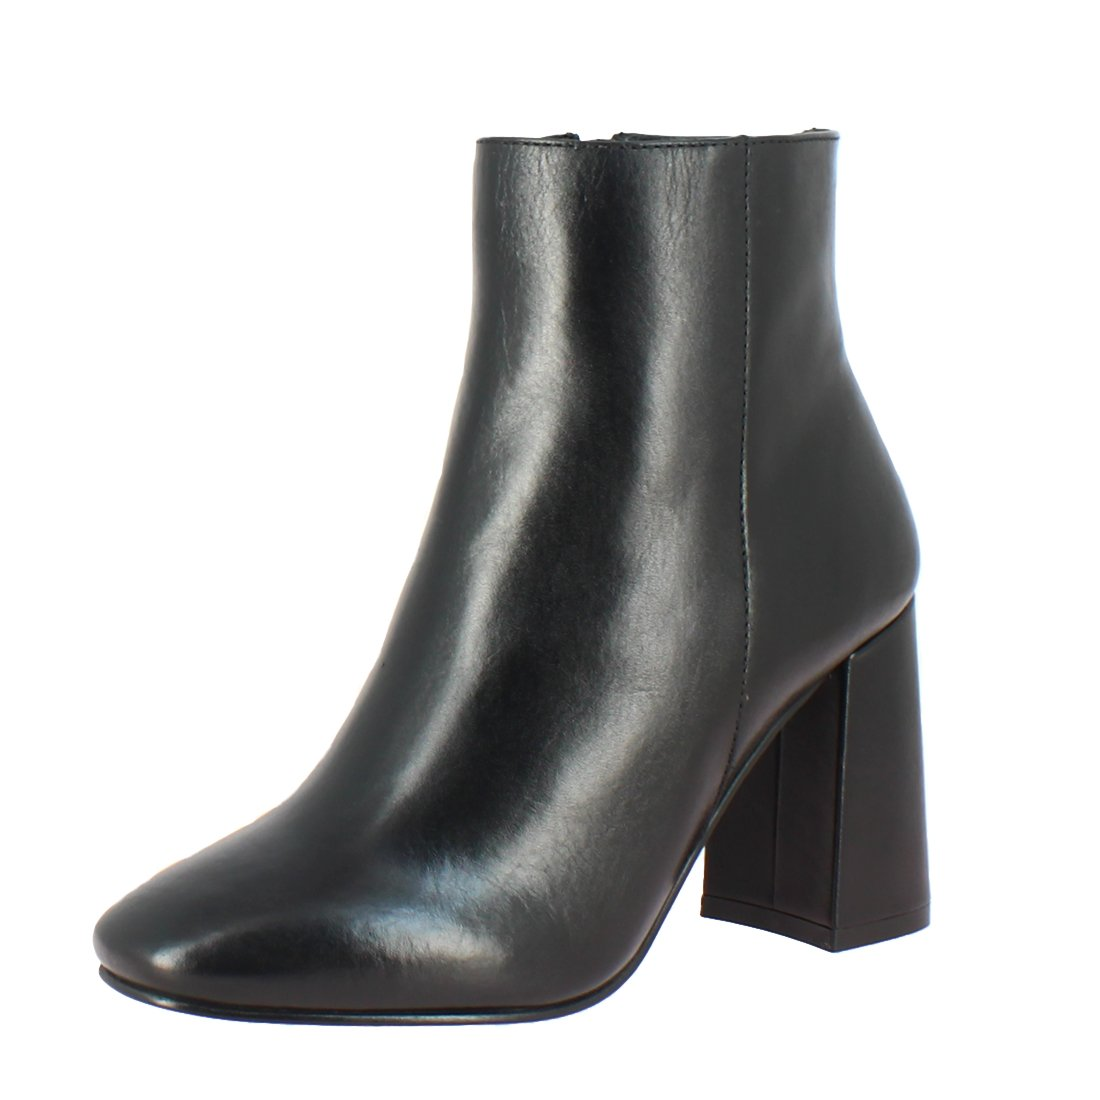 Buy Saint G Womens Black Napa Leather